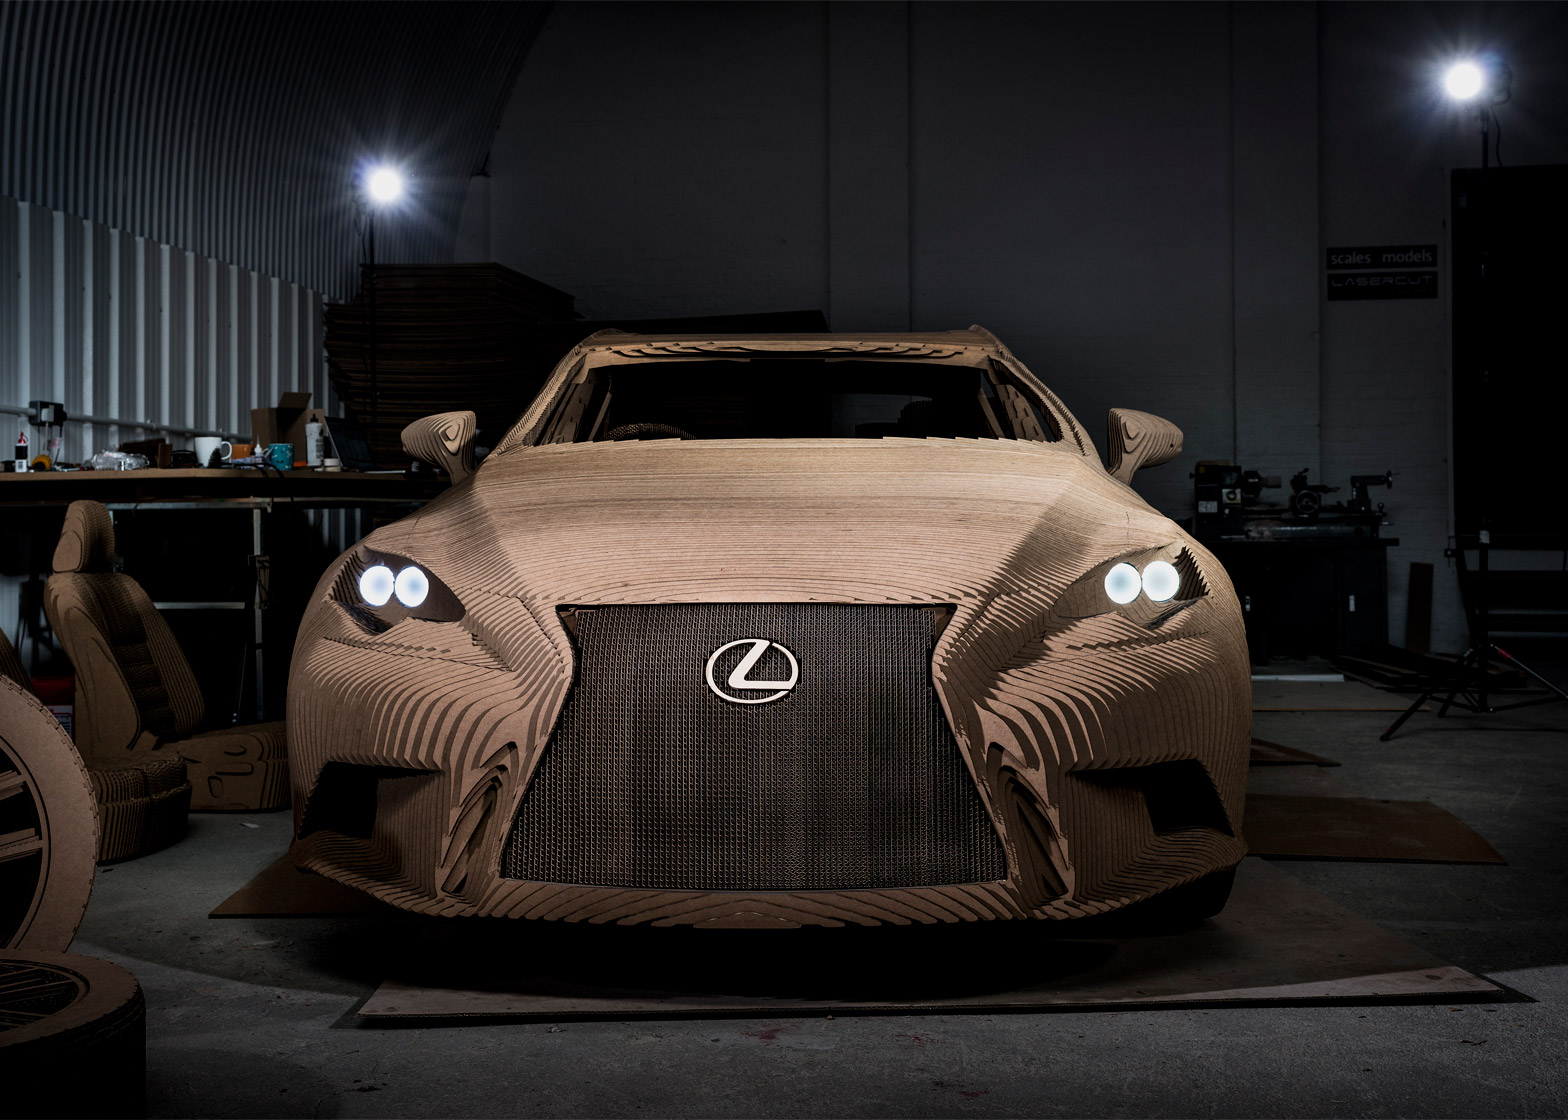 Cardboard-Origami-Car_Lexus_dezeen_1568_0